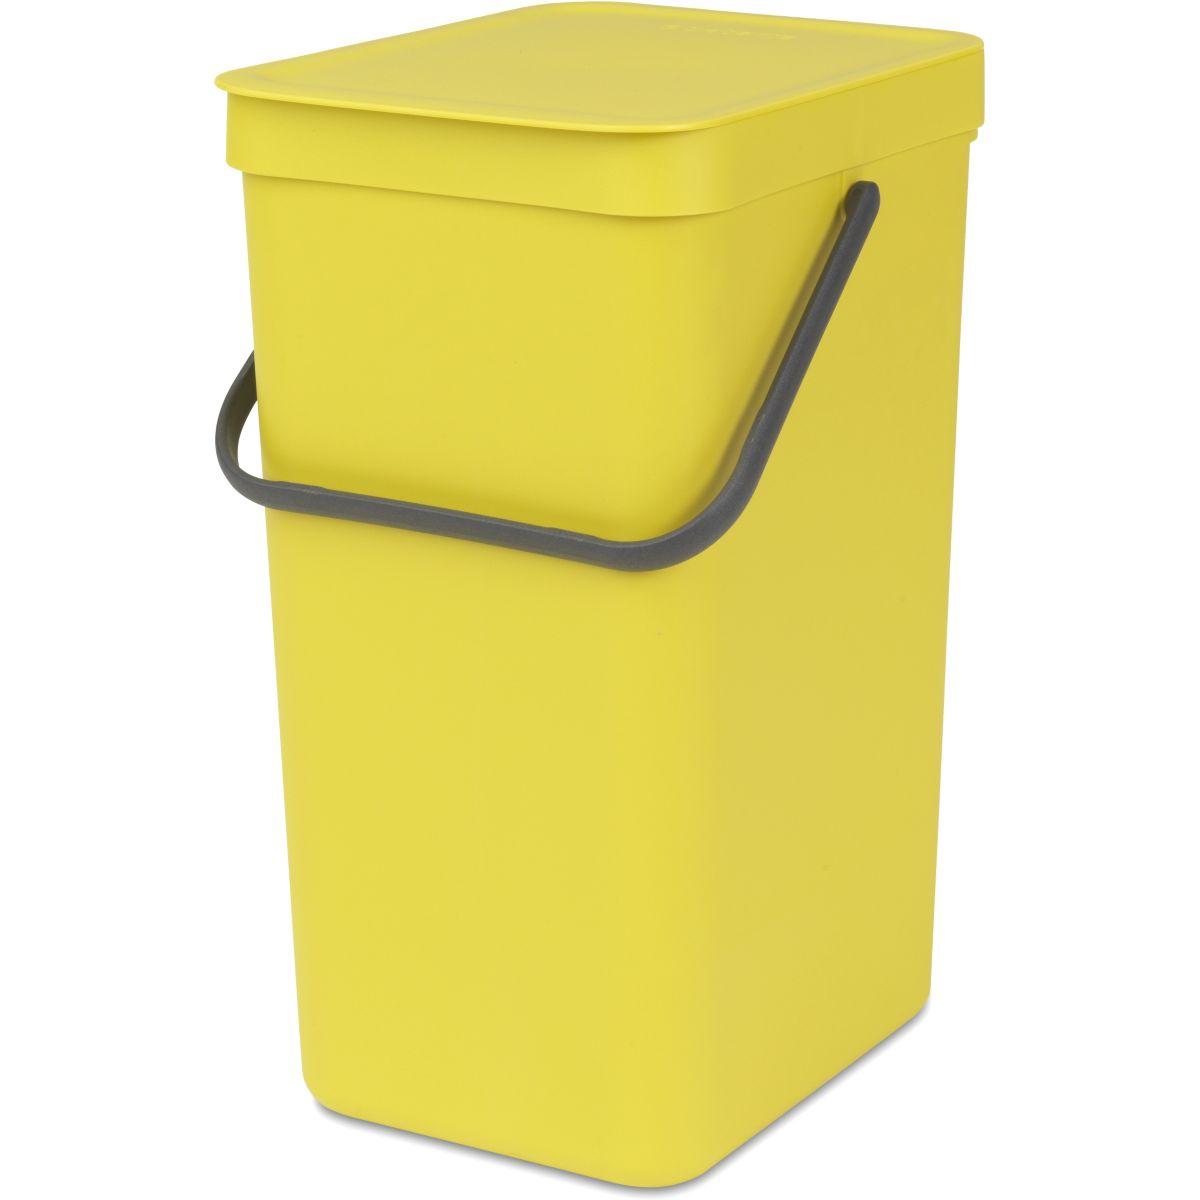 Poubelle manuelle BRABANTIA Waste Bin Sort & Go 16L Yellow